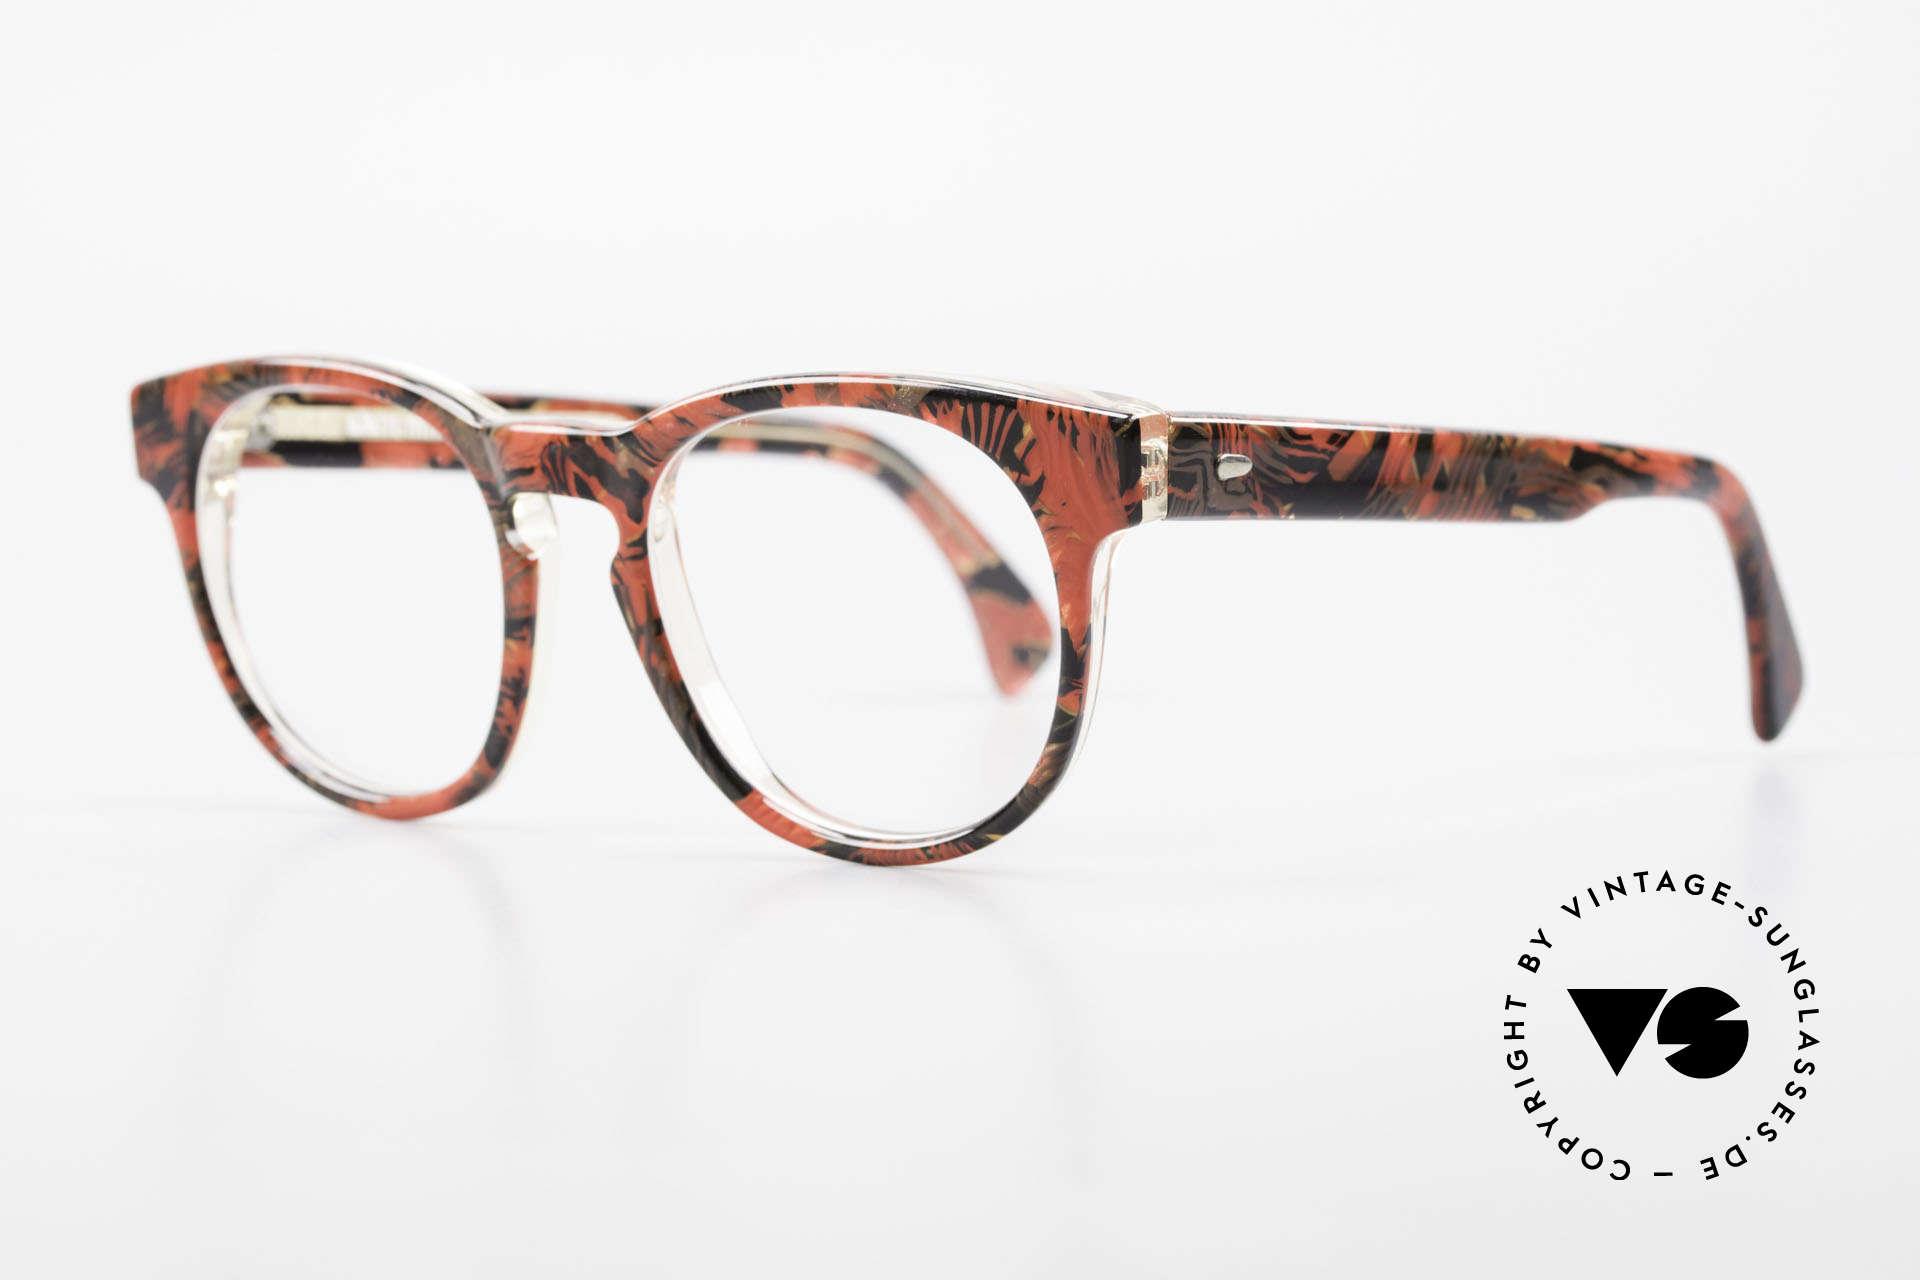 Alain Mikli 903 / 687 Patterned 80's Panto Glasses, inspired by the 1960's 'Tart Optical Arnel' frames, Made for Men and Women